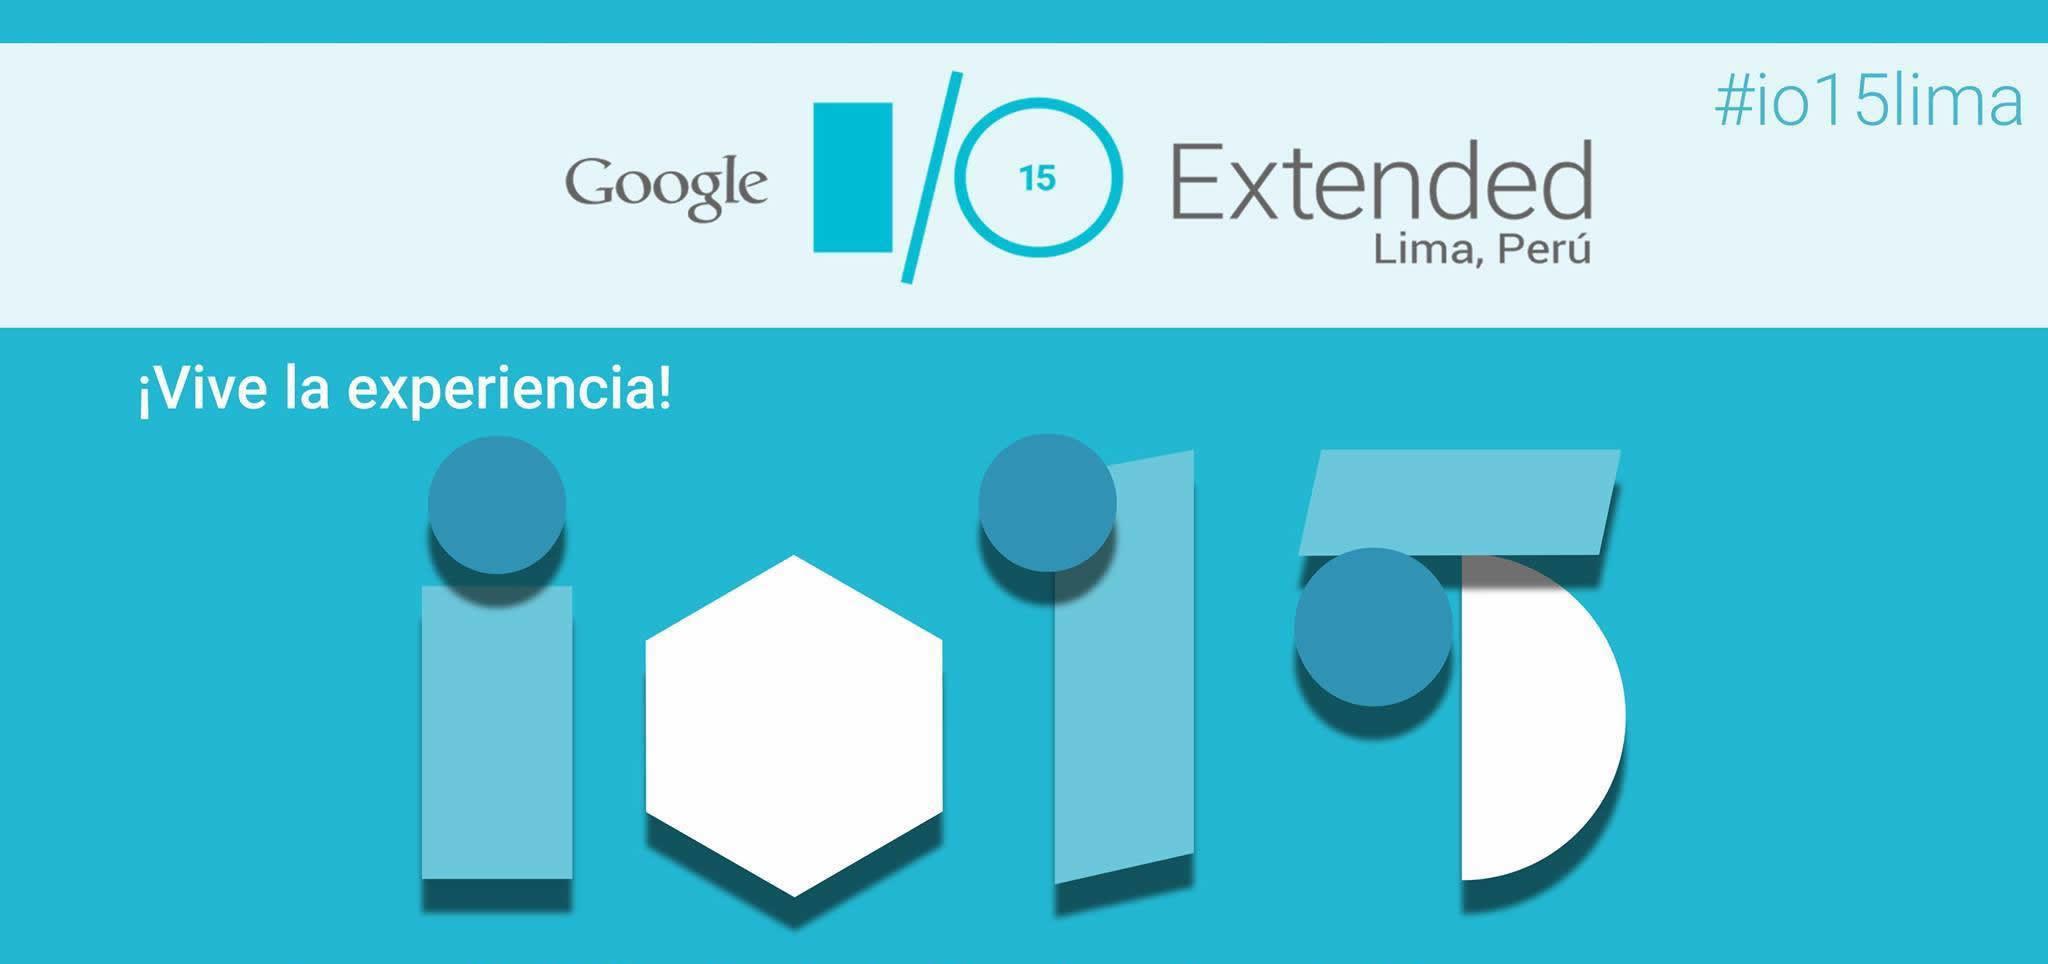 Participando en el Google I/O Extended Lima 2015